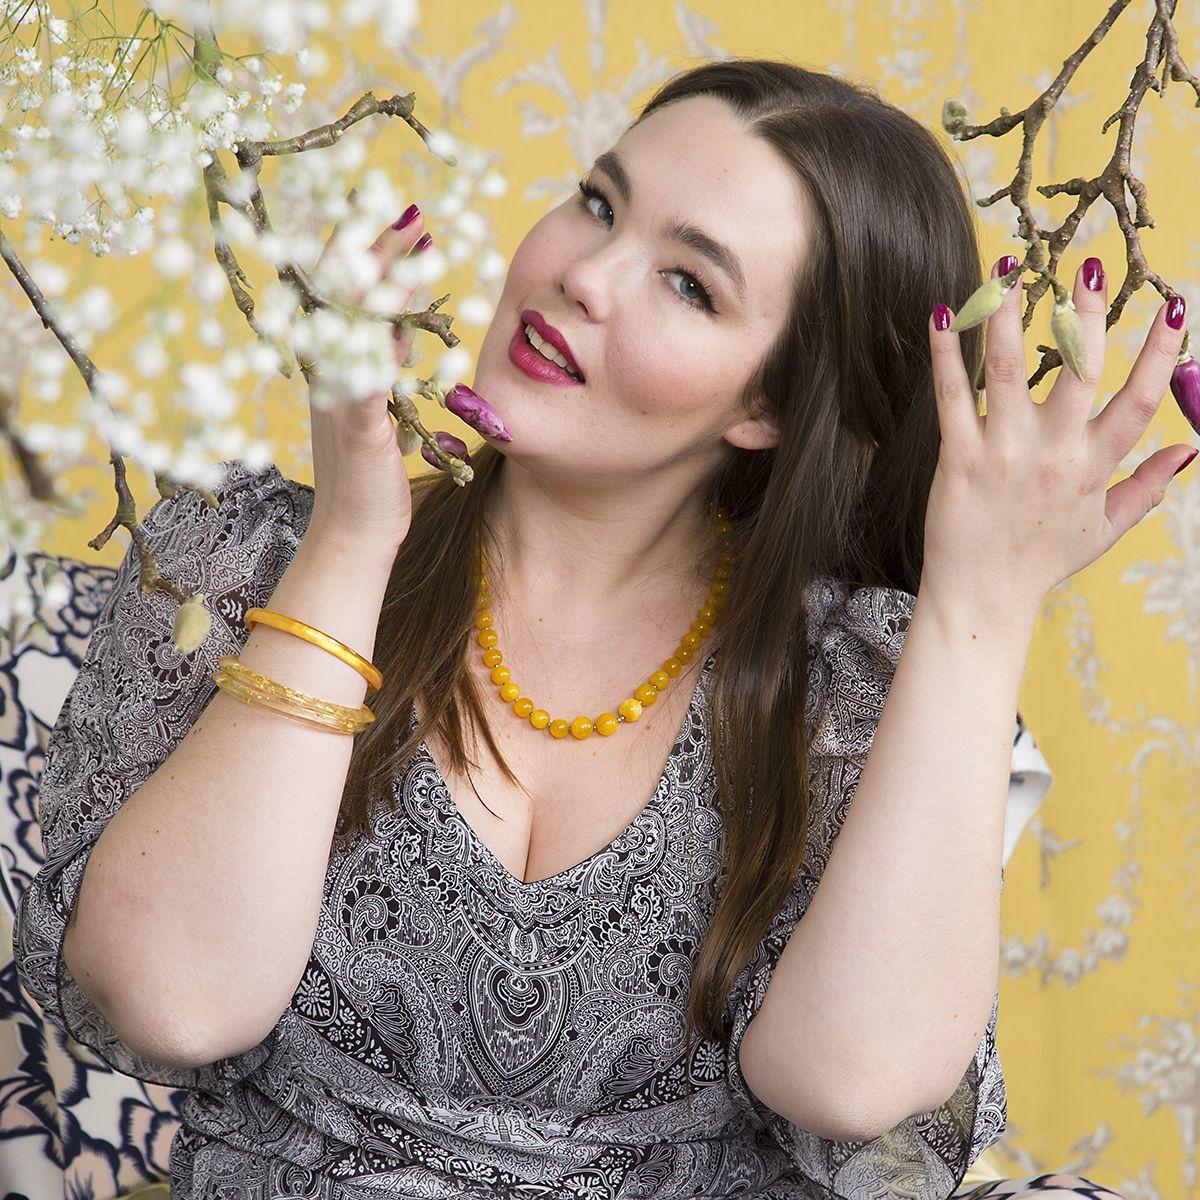 Diana Maxi Dress Photo: Nanna Hänninen Make up: Satu Arvo Model: Ninja Sarasalo